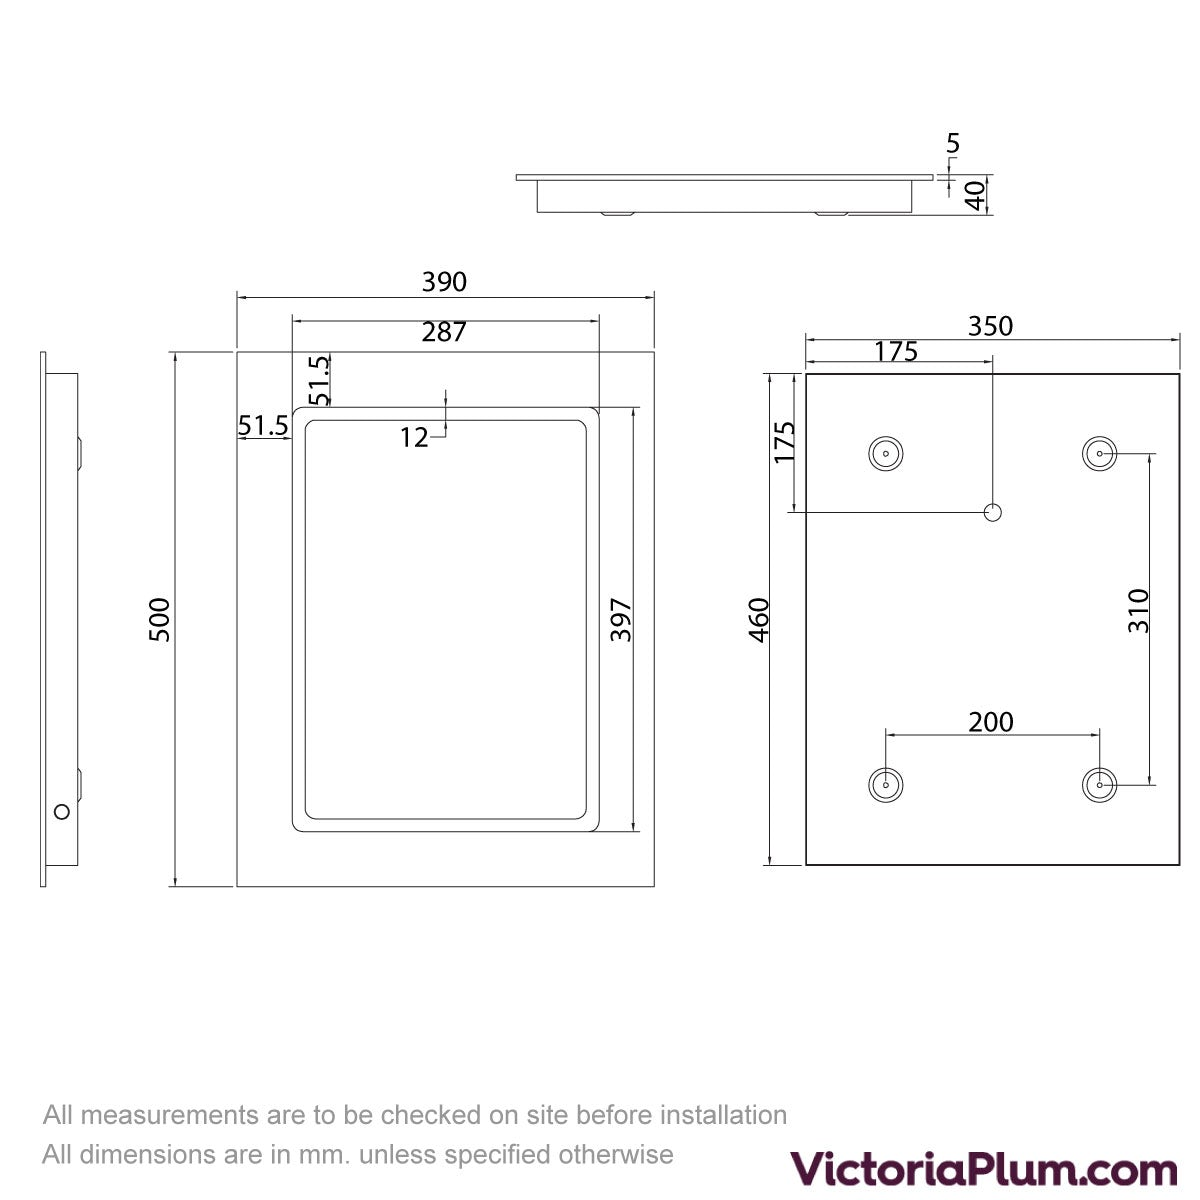 Dimensions for Mode Grayson LED Mirror defogger & sensor 390x500